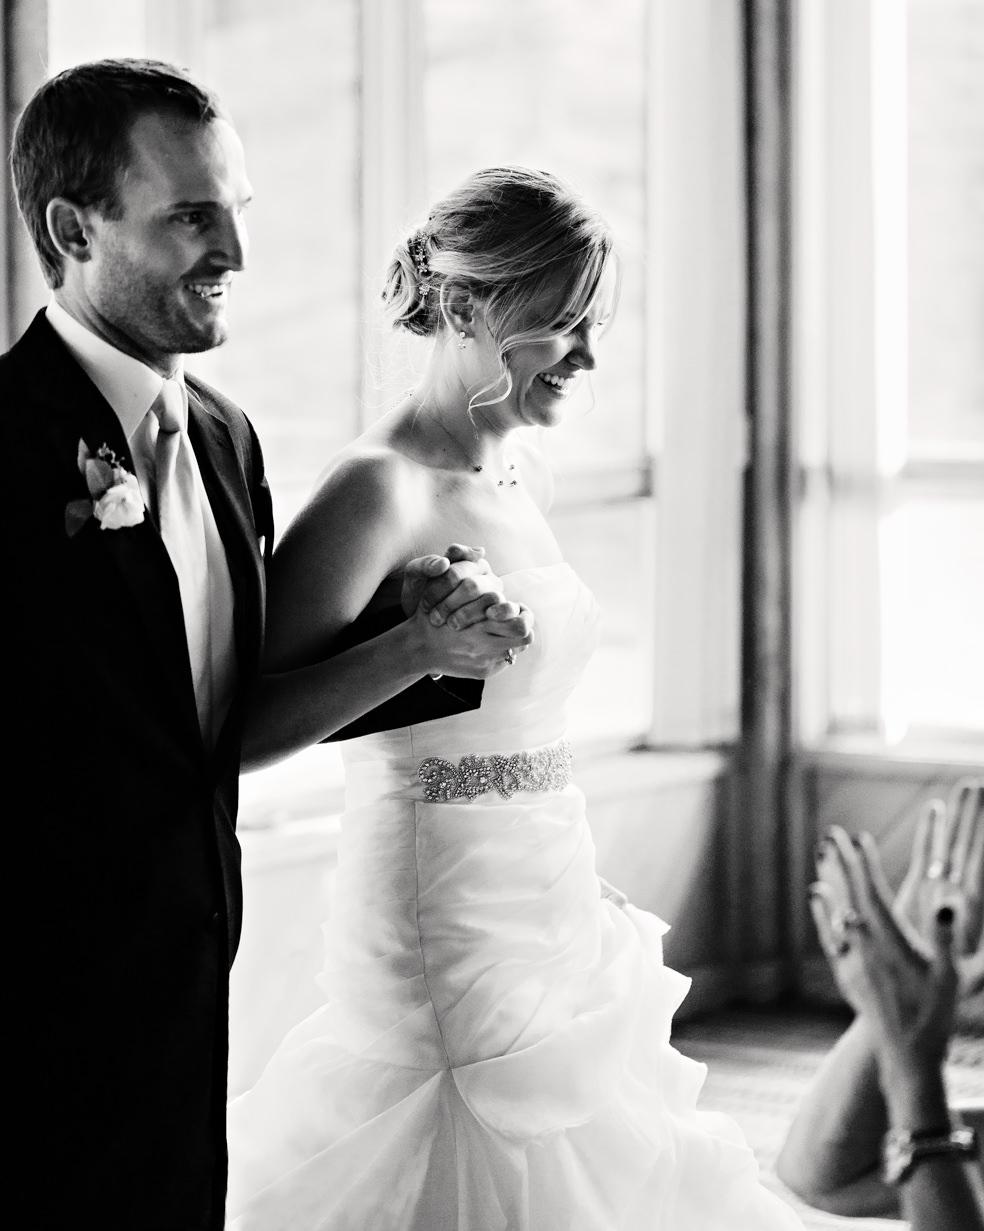 big-sky-resort-wedding-bride-groom-enter-reception.jpg